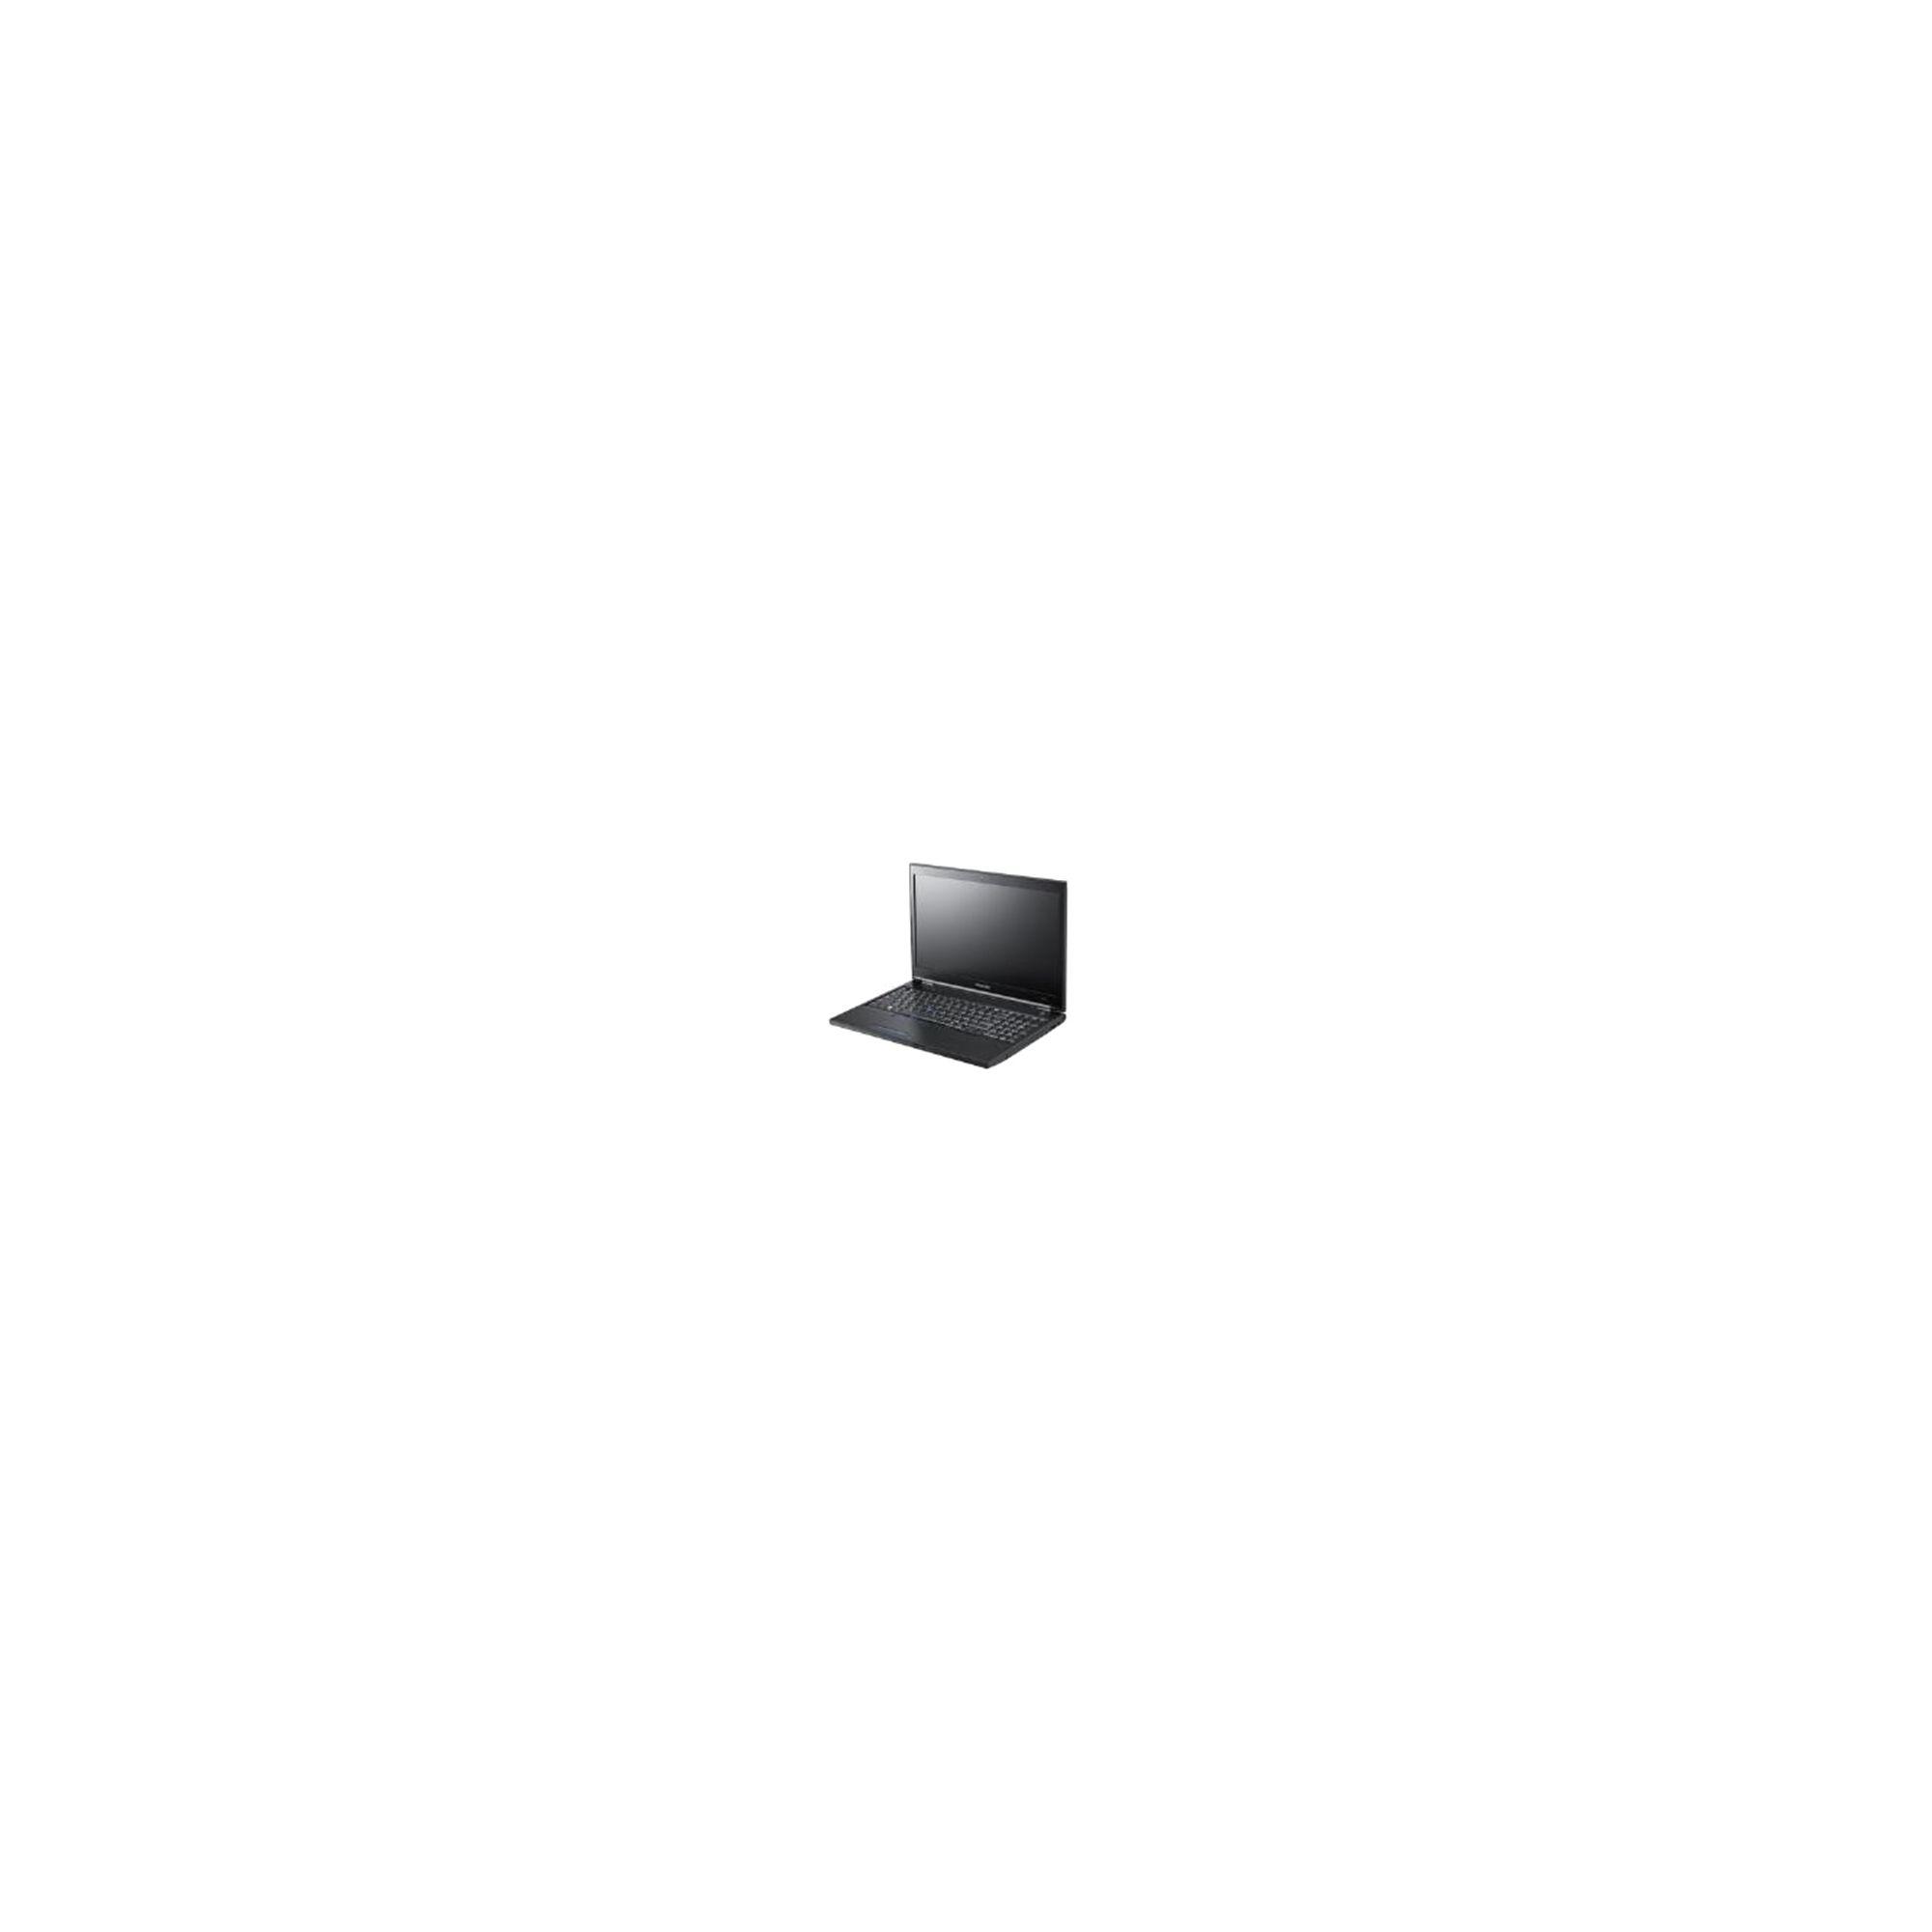 Samsung 400B5C (15.6 inch) Notebook PC Core i5 (3210M) 2.5GHz 4GB 500GB DVD-SuperMulti DL WLAN BT Webcam Windows 7 Pro 64-bit (Intel HD Graphics 4000) at Tesco Direct